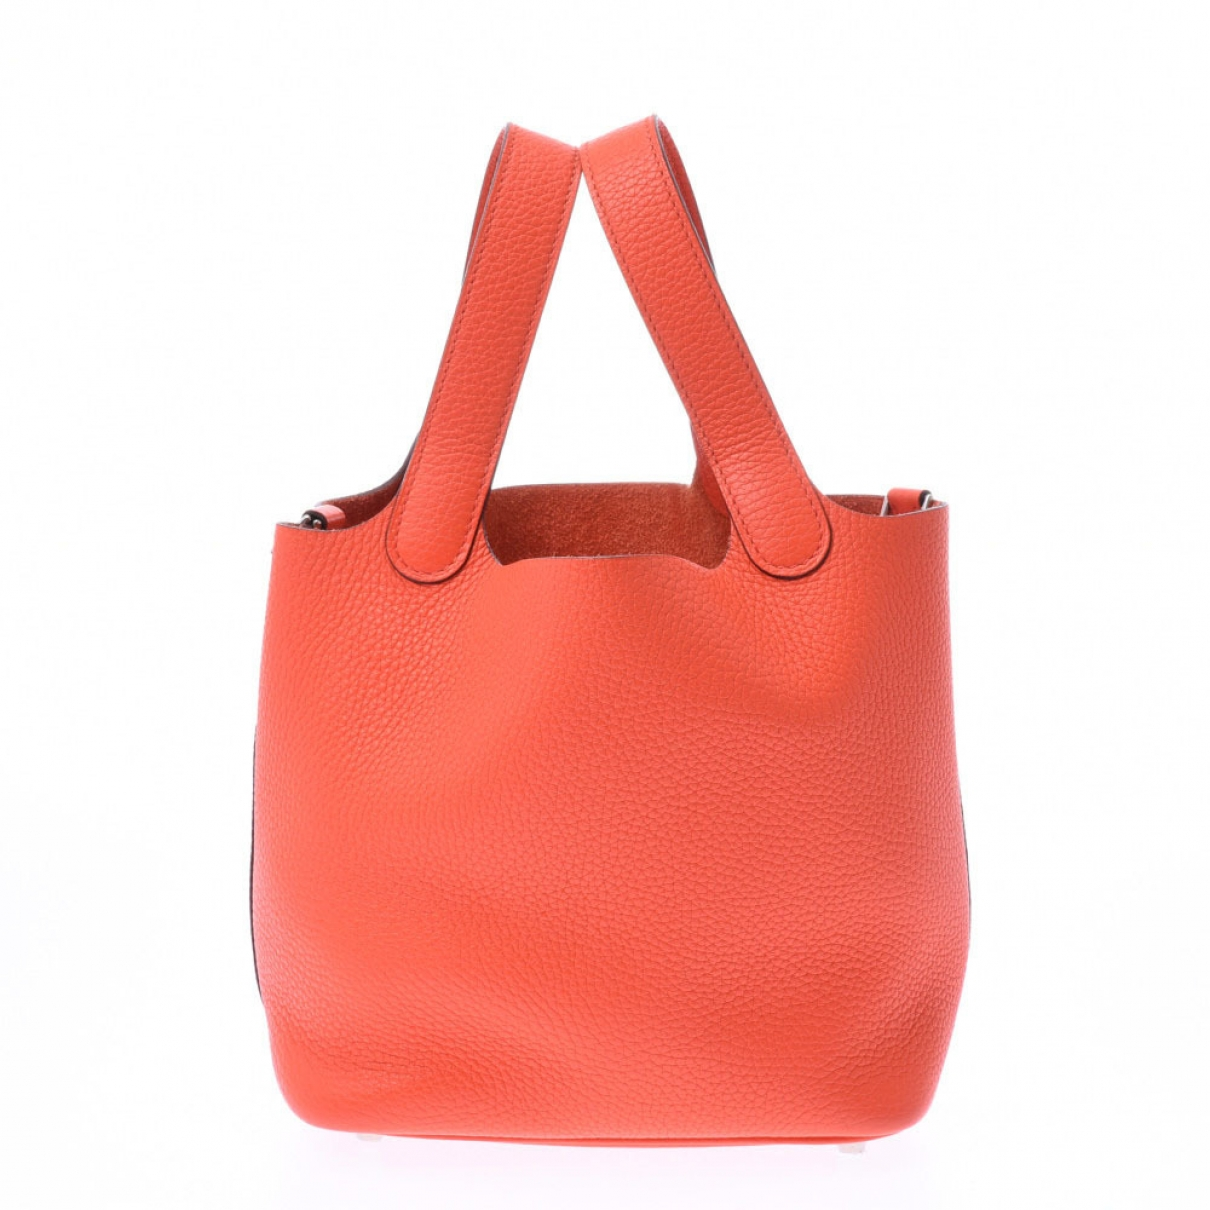 Hermes - Sac a main Picotin pour femme en cuir - orange